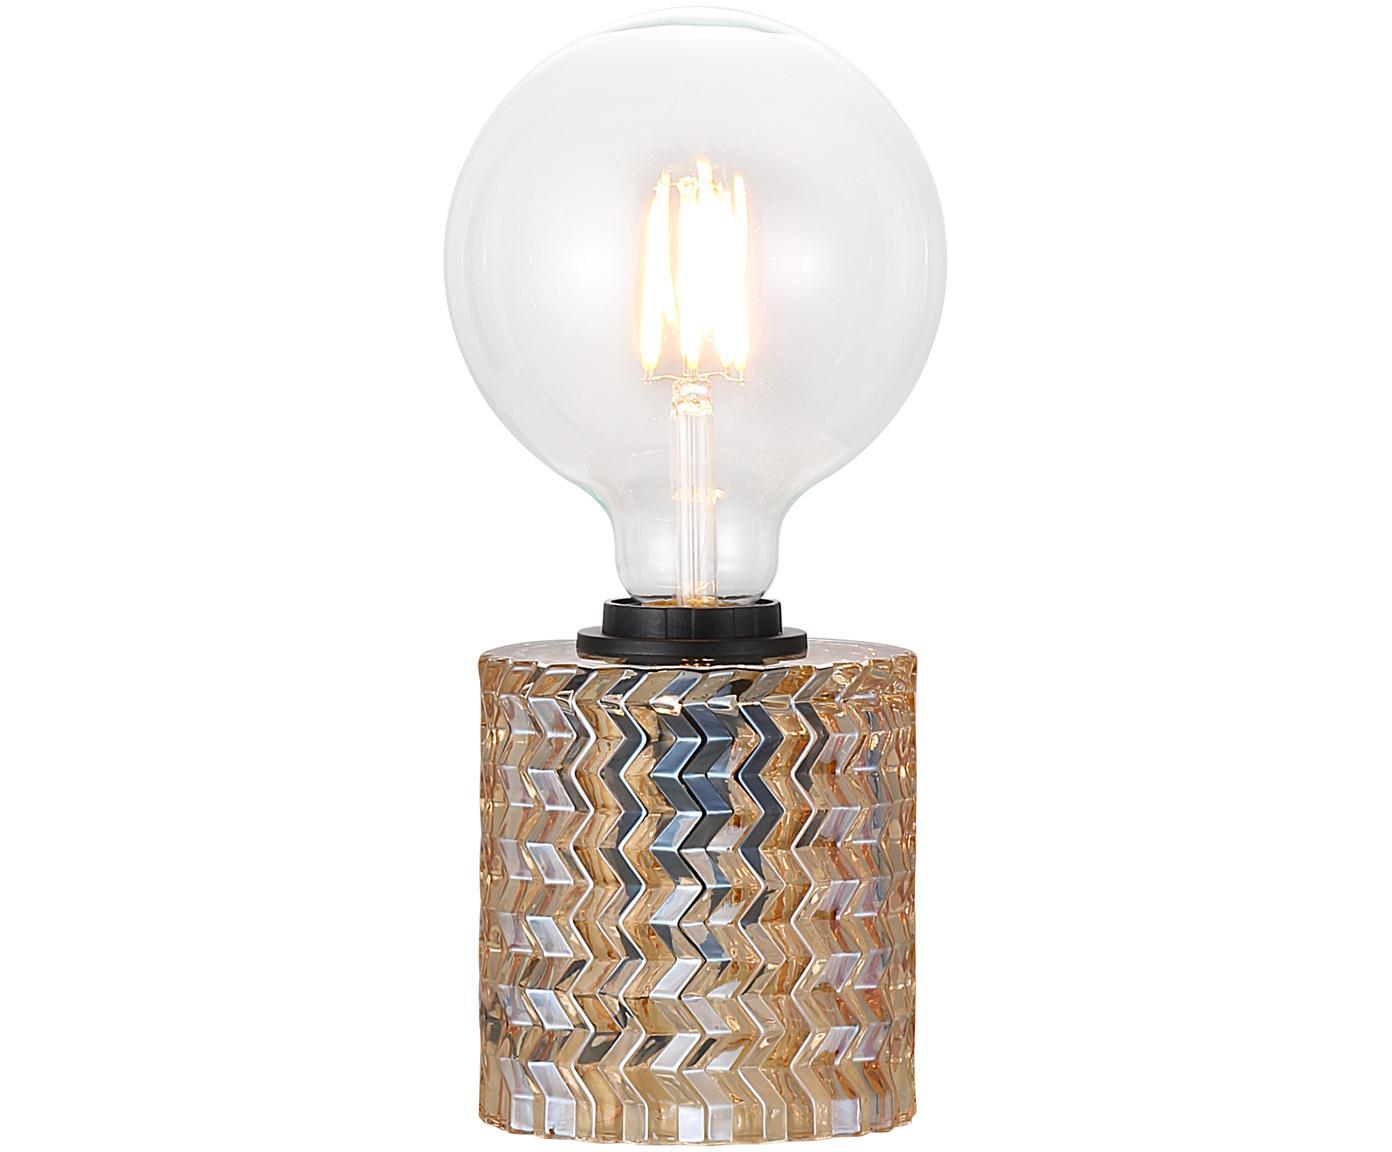 Lampada da tavolo in vetro Hollywood, Oro, Ø 11 x Alt. 13 cm